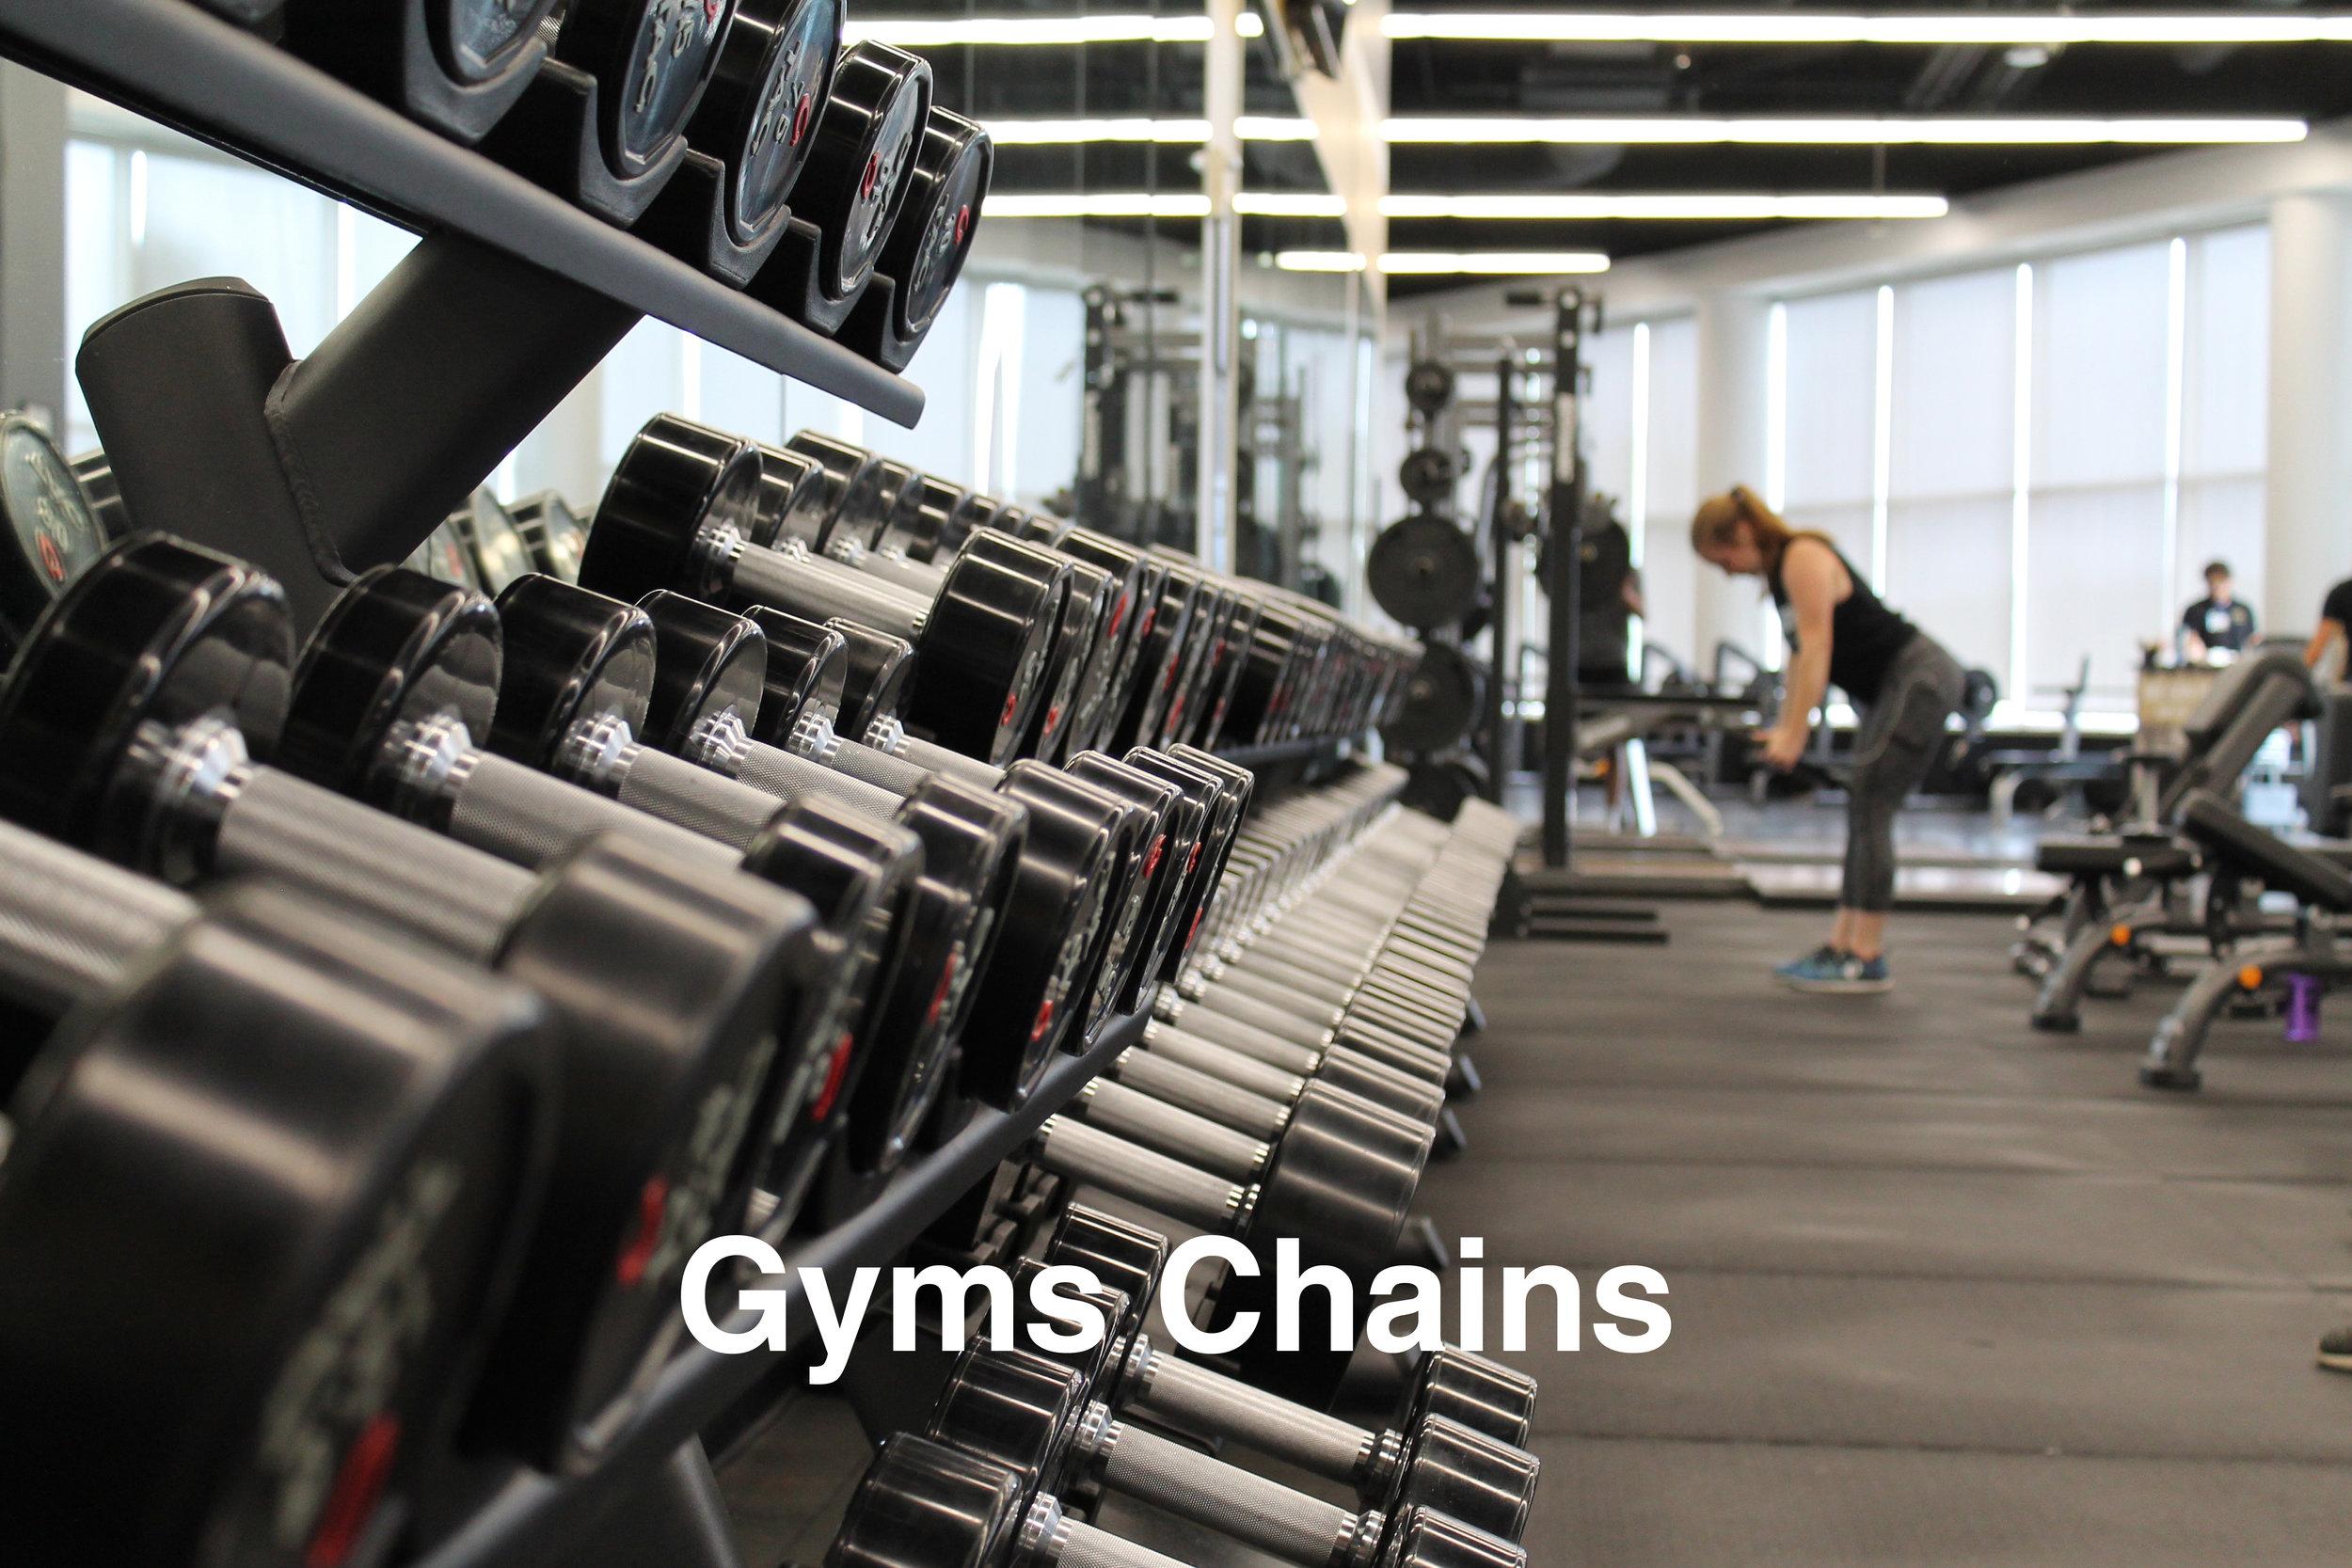 Gym Chains text.jpg